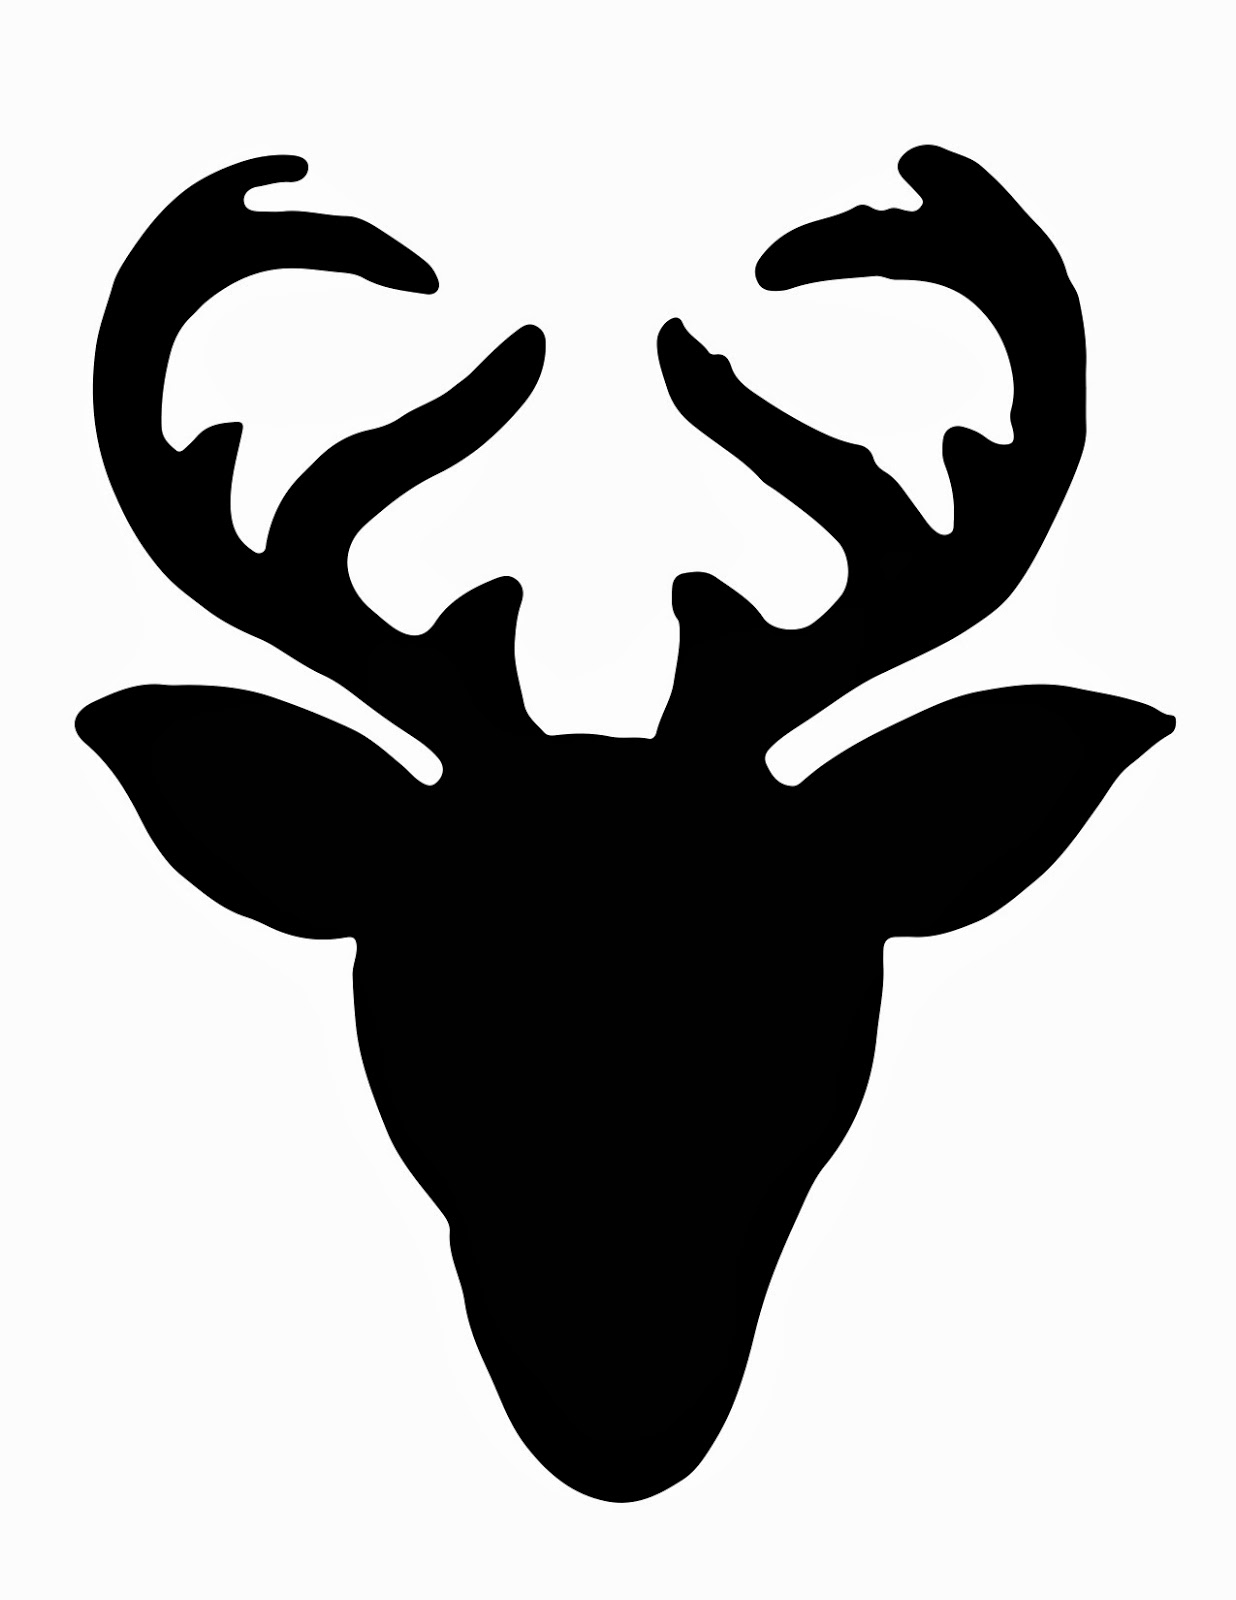 1236x1600 Deer Head Silhouette Clipart